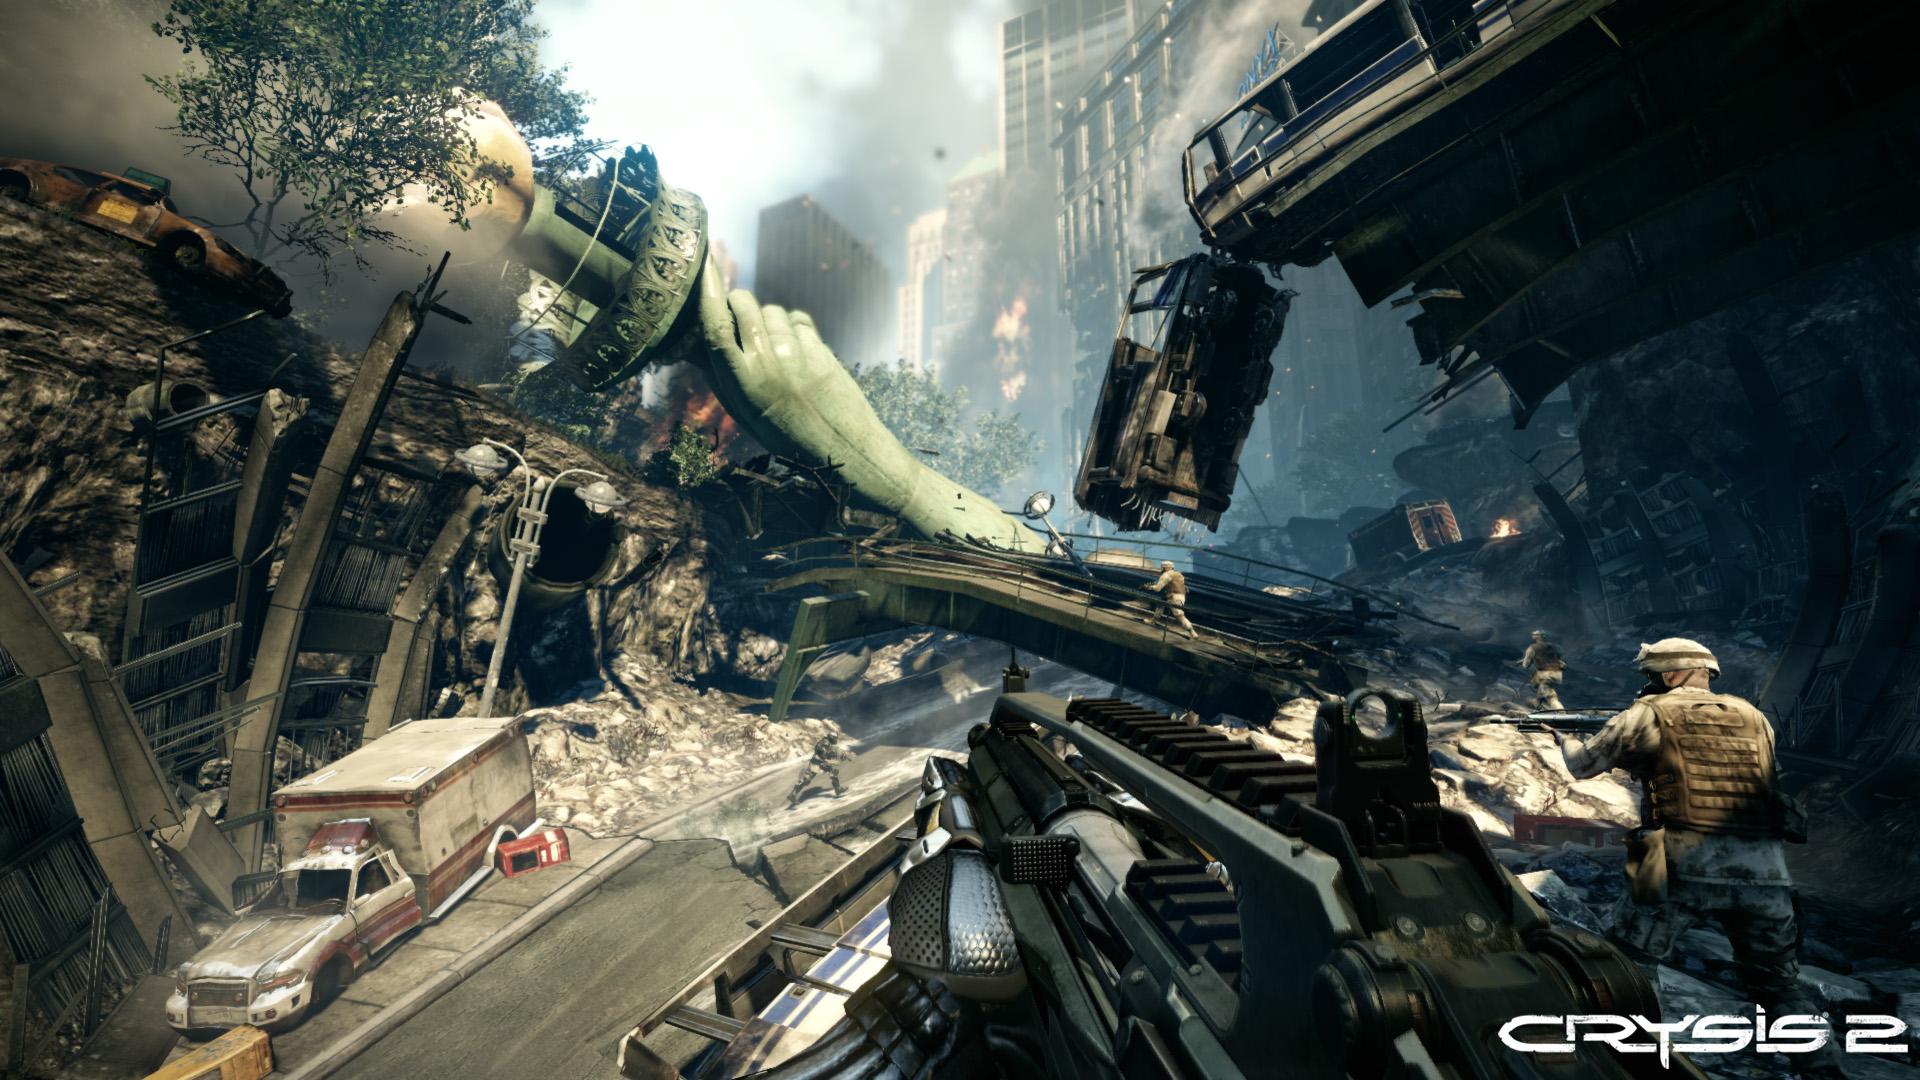 Crysis 2 keygen [updated] [june 2013] video dailymotion.